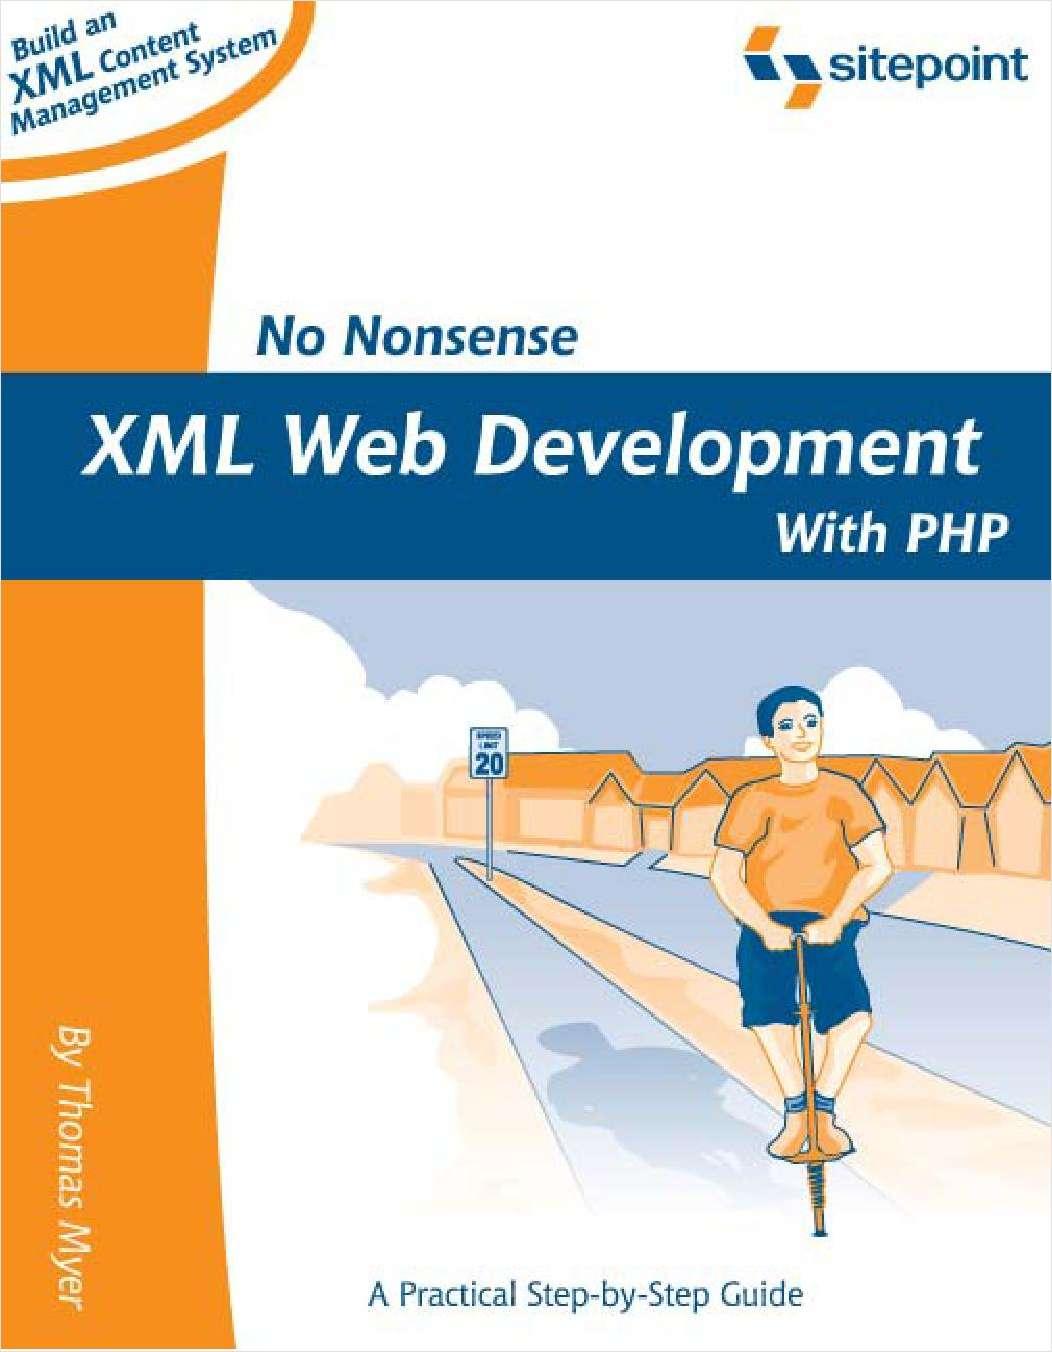 No Nonsense XML Web Development With PHP - Free 146 Page Preview!